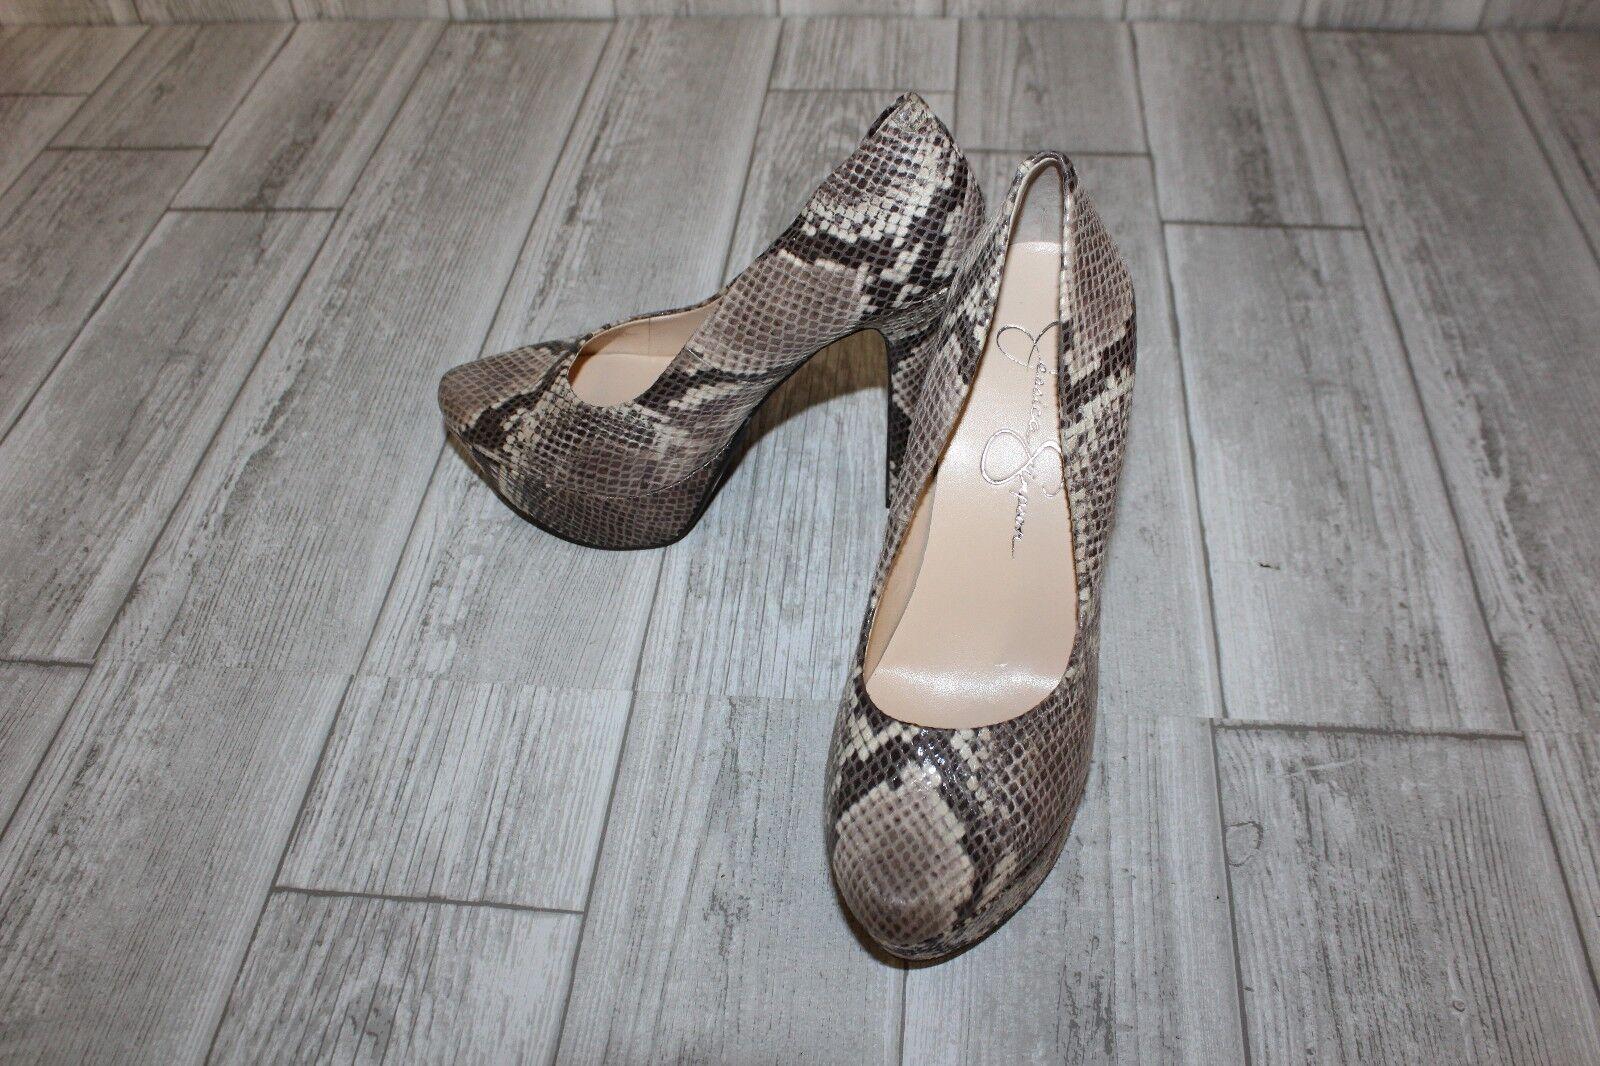 Jessica Simpson Waleo Pumps - Women's Size 6M, Tan Faux-Snakeskin